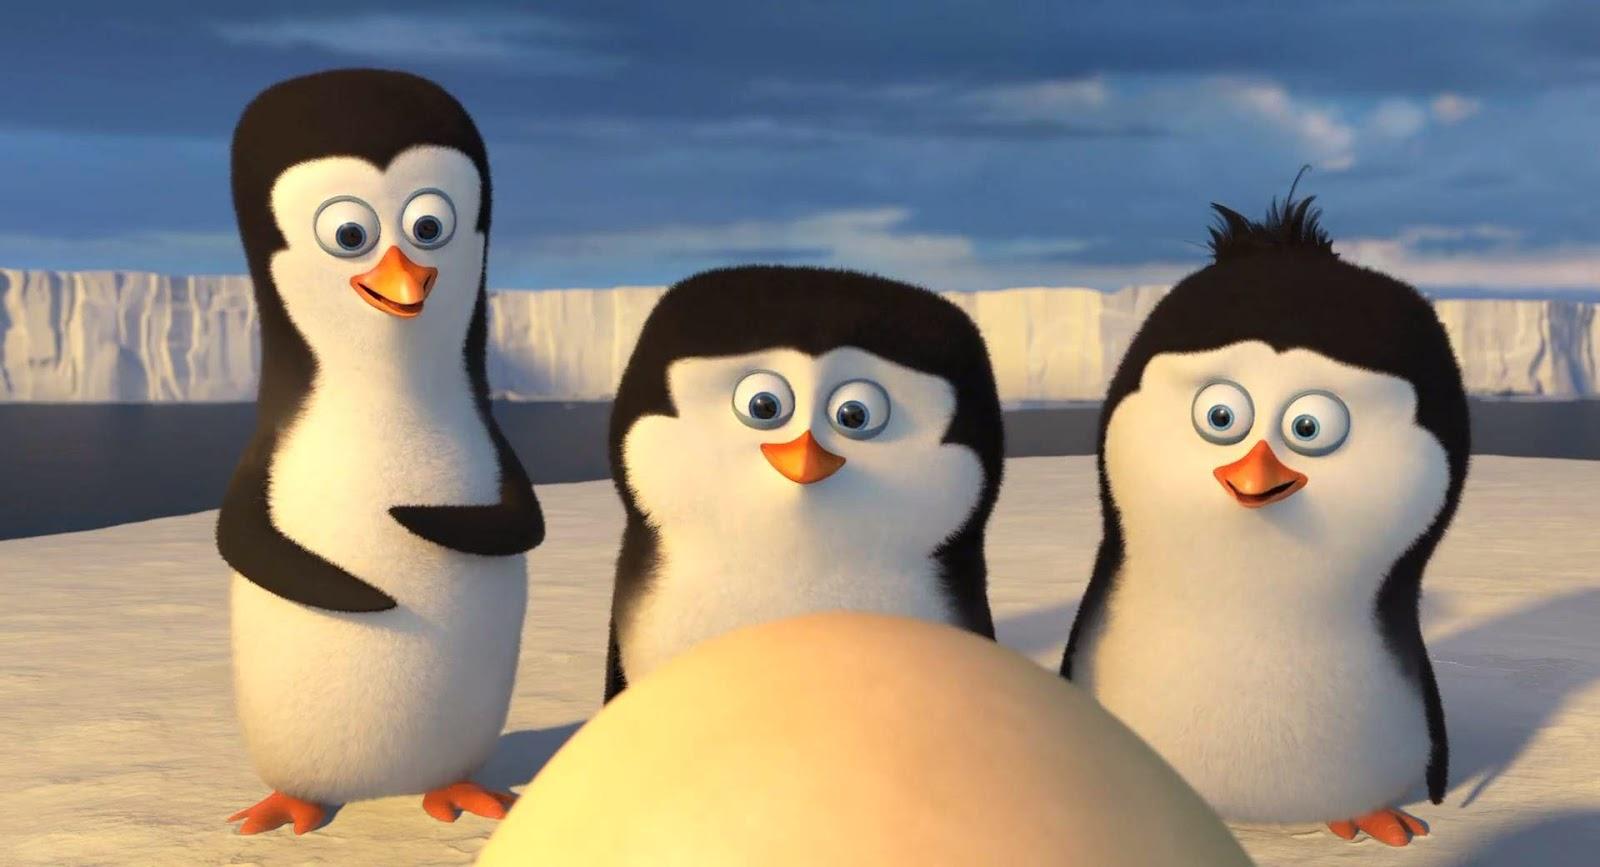 Penguins of Madagascar (2014) 1080p 1080p S4 s Penguins of Madagascar (2014) 1080p 1080p